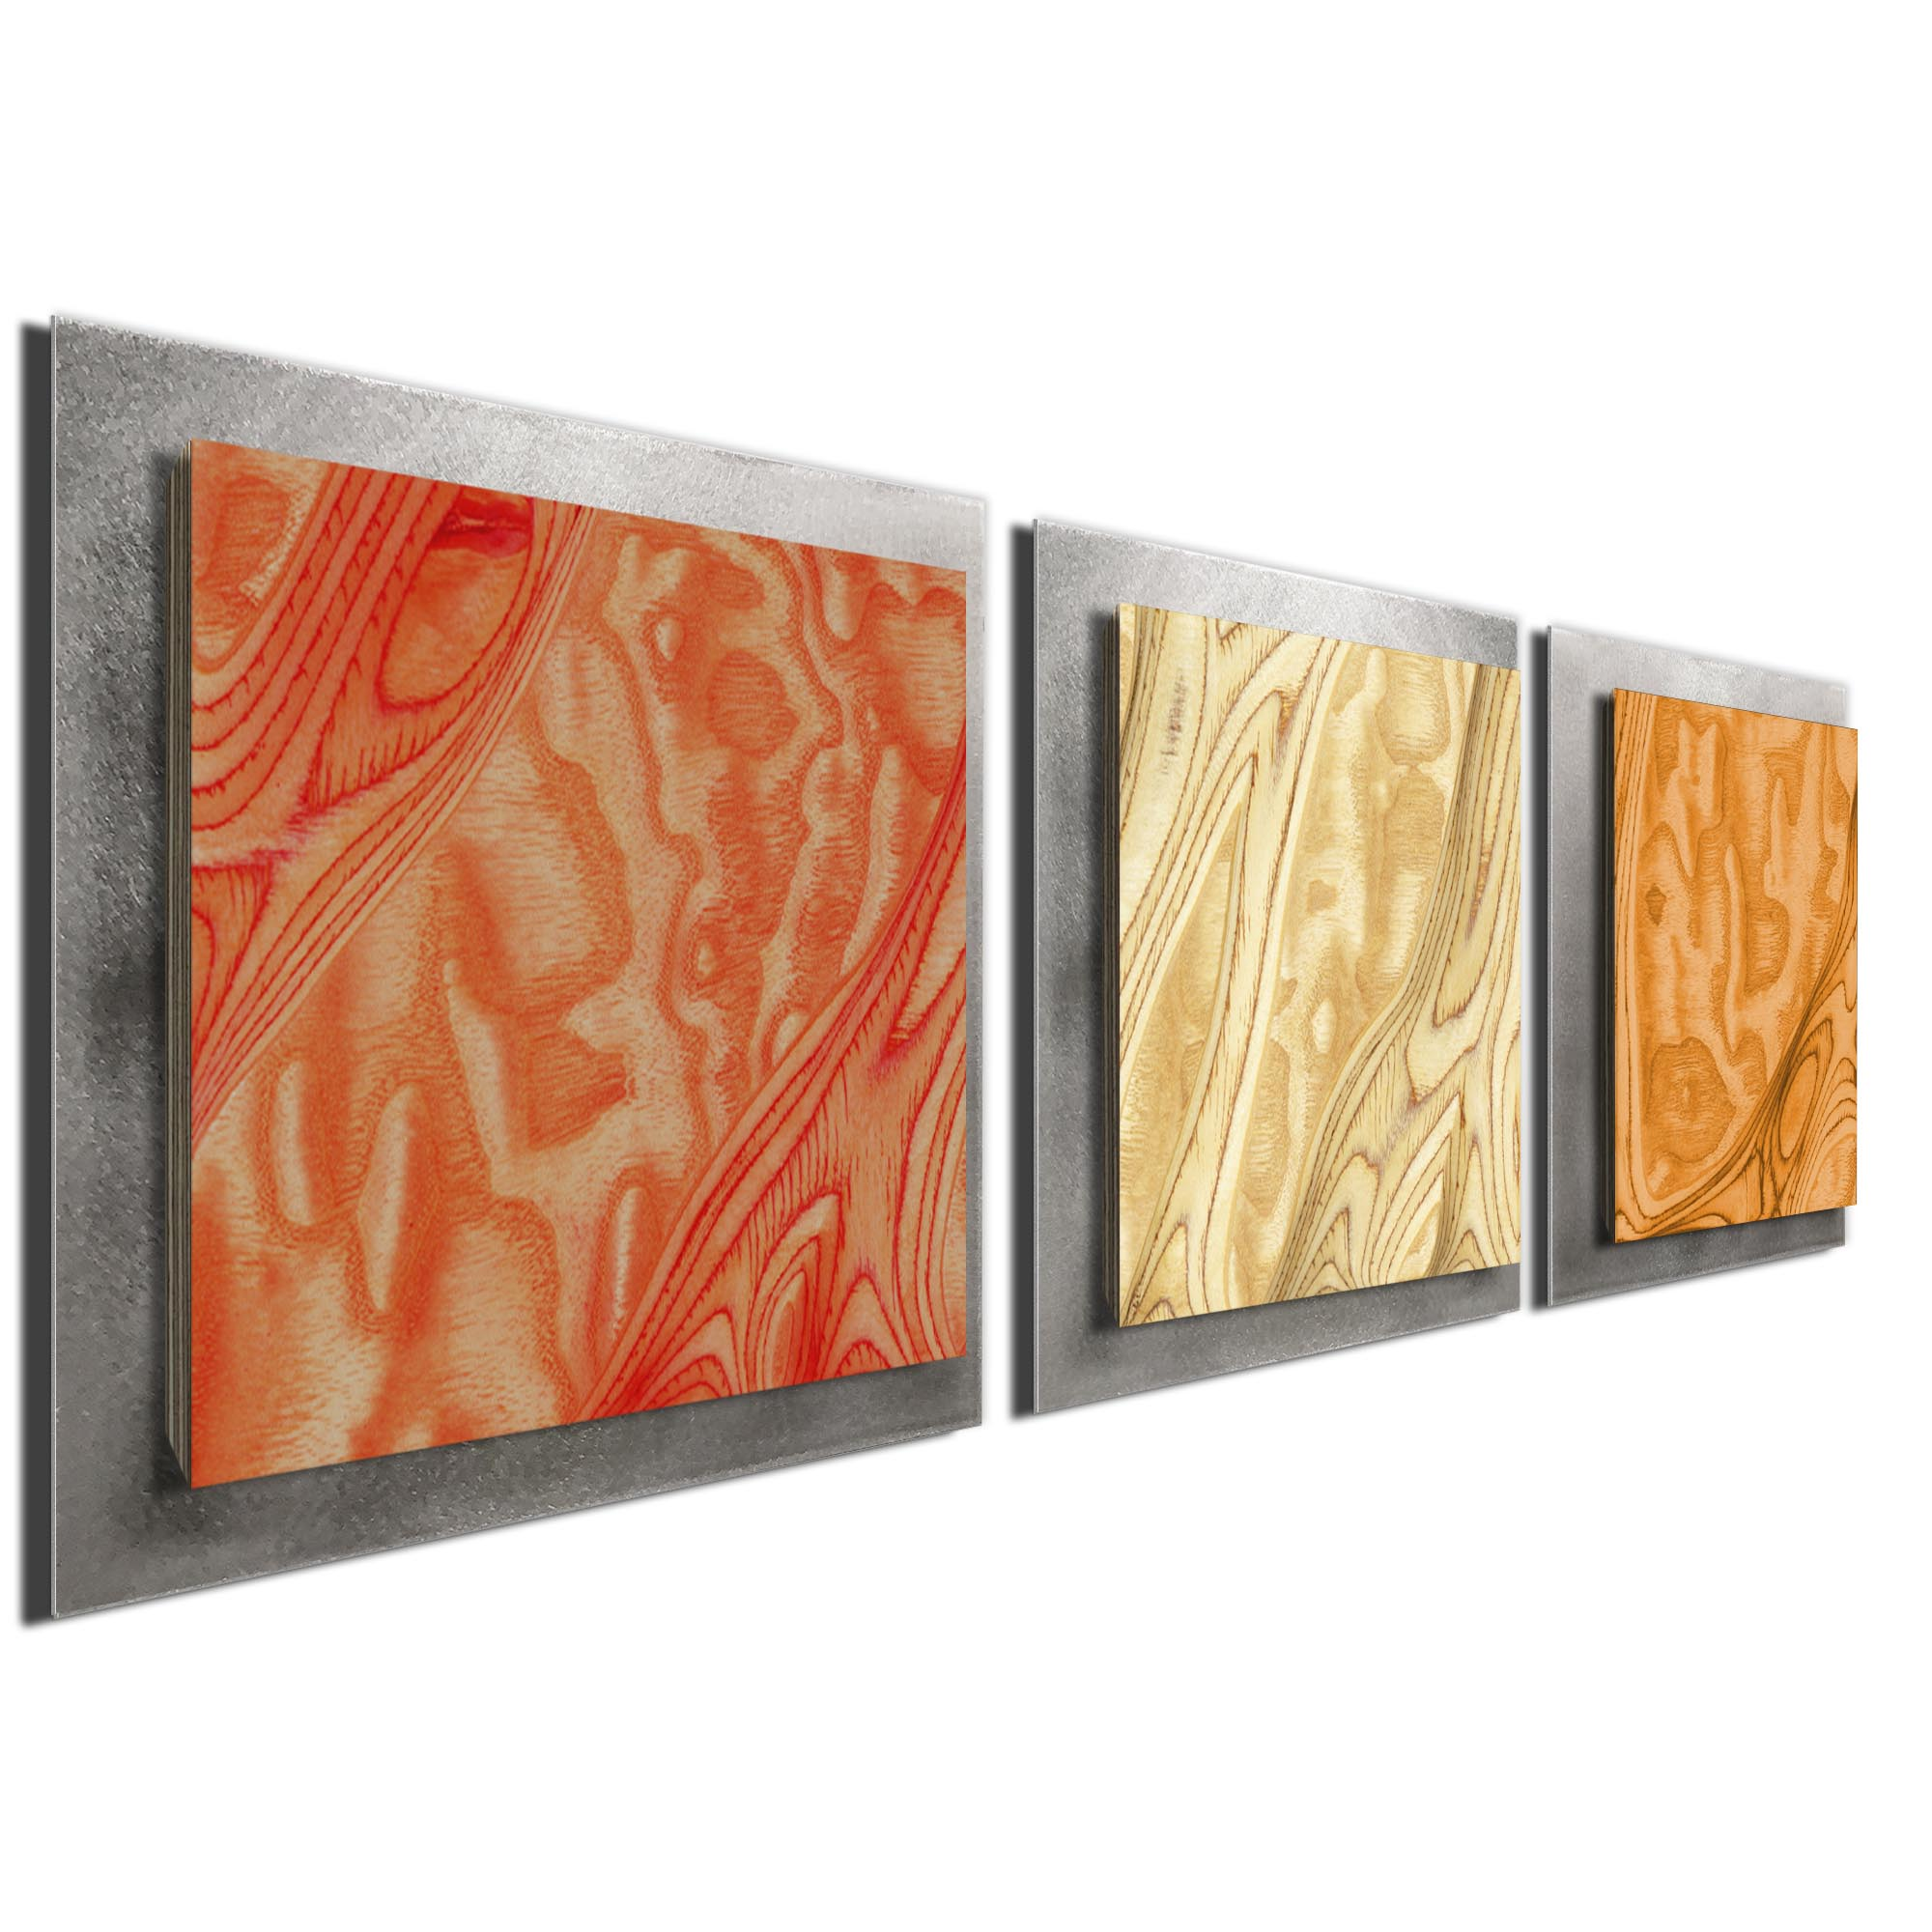 Autumn Burl Essence Silver by Jackson Wright Rustic Modern Style Wood Wall Art - Image 2